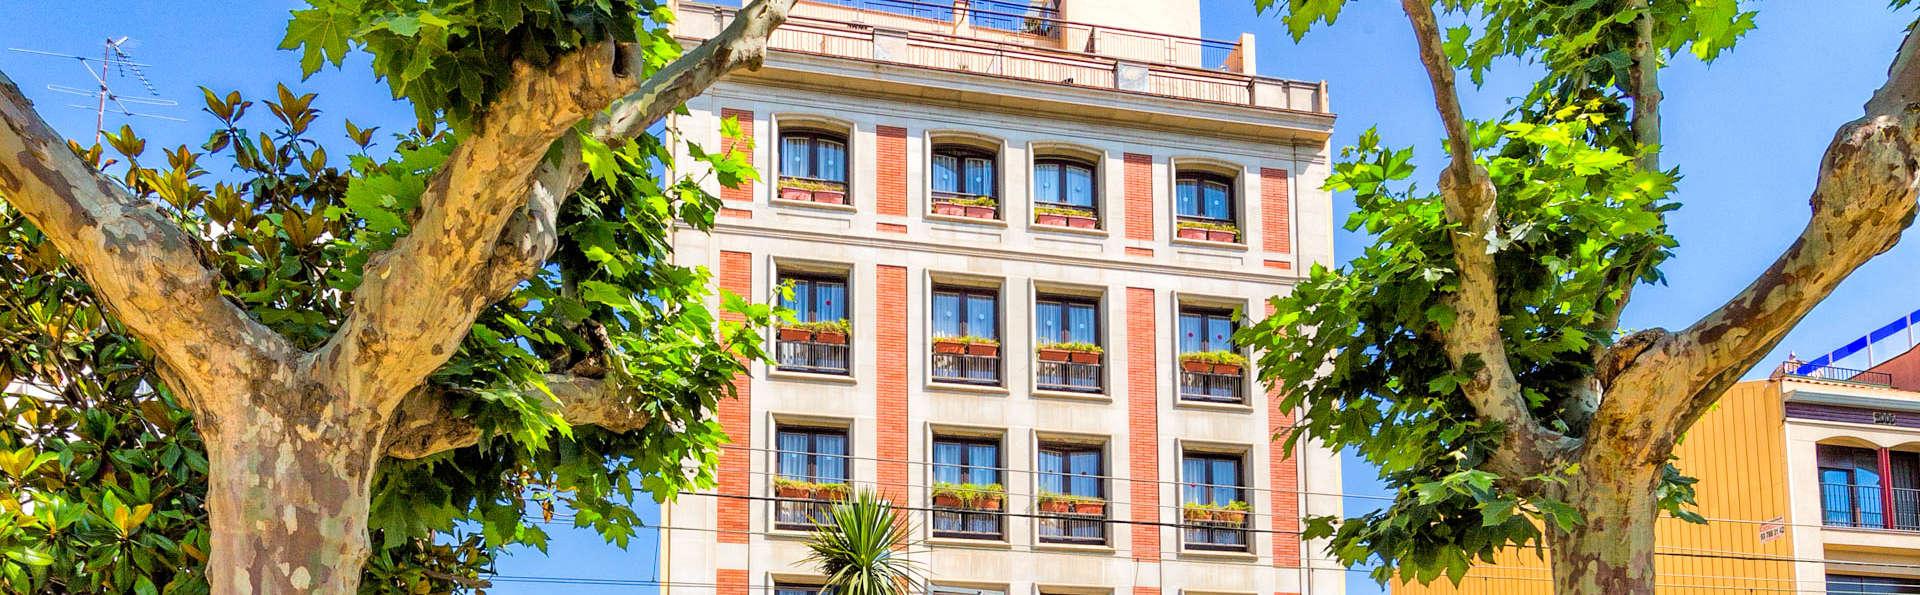 Hotel Espanya - EDIT_FRONT5.jpg